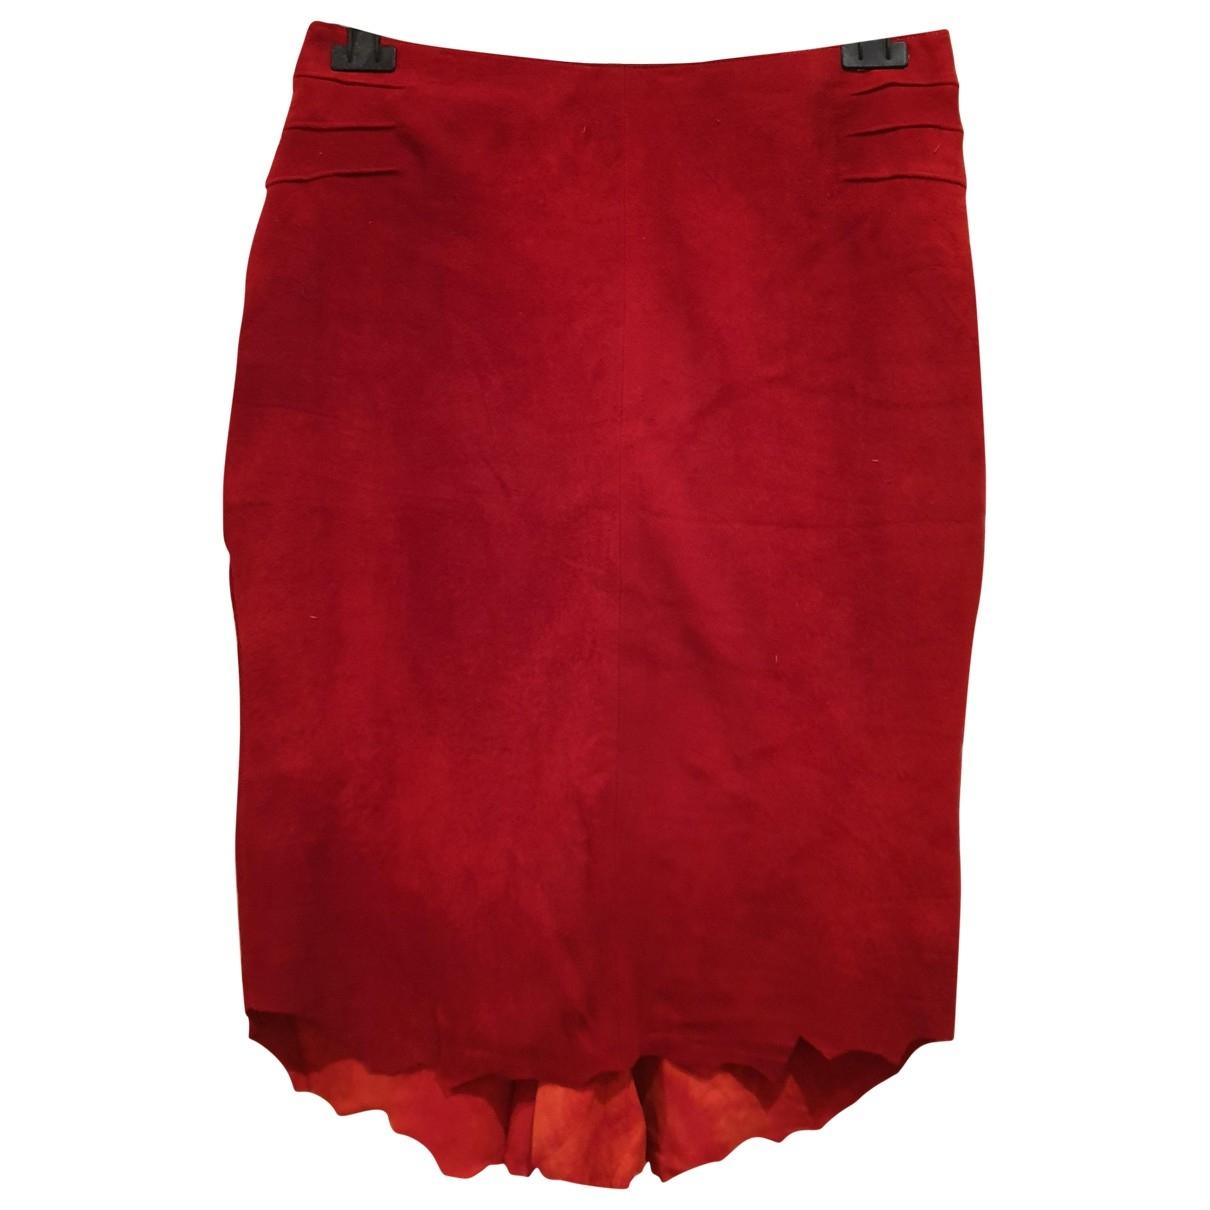 Roberto Cavalli - Jupe   pour femme en suede - rouge